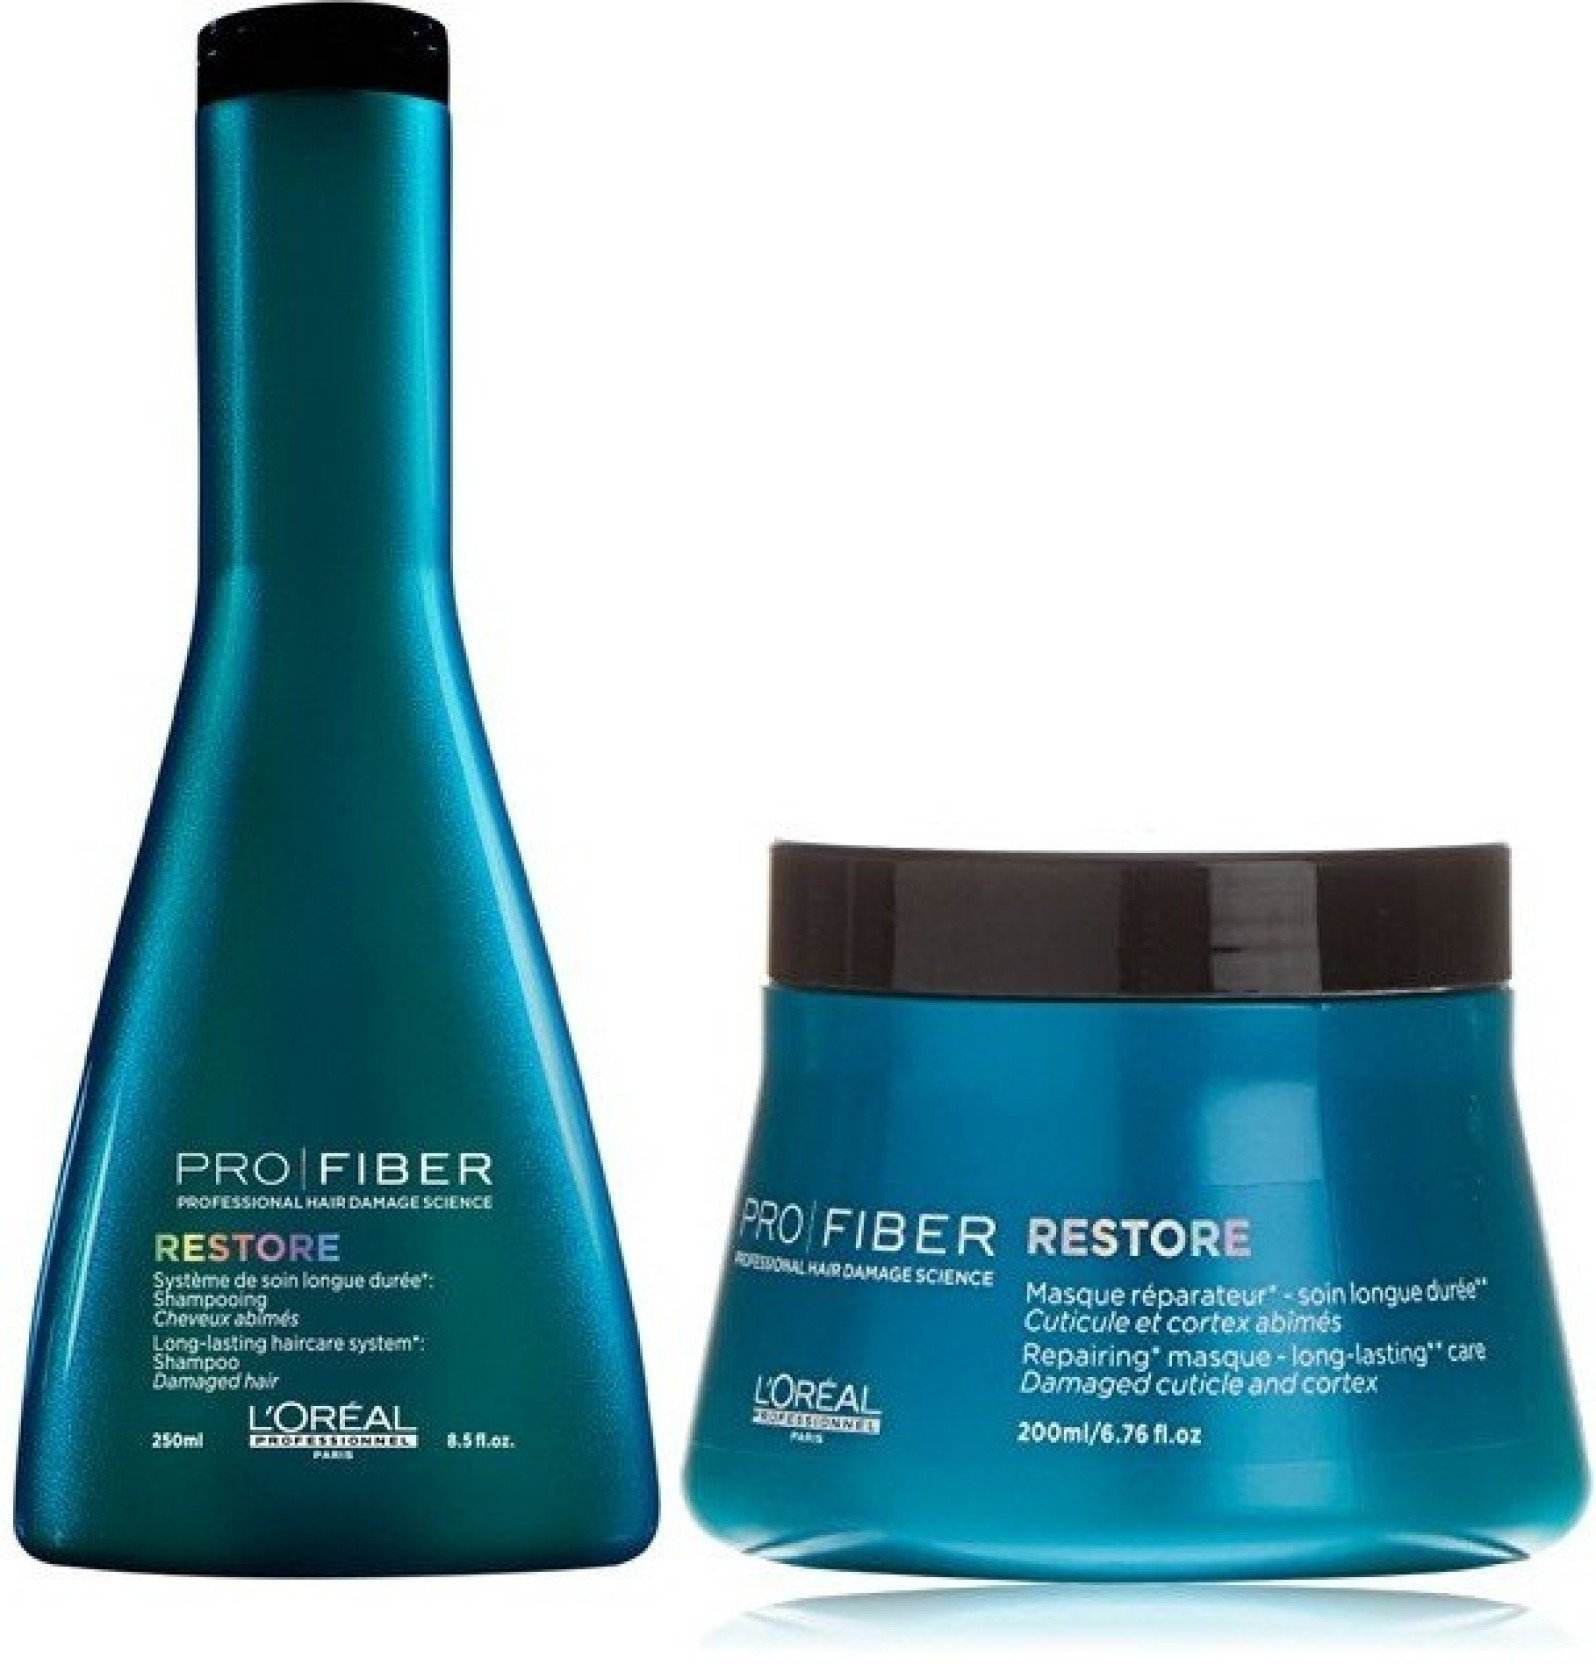 9d0581b45 L Oreal Professionnel Pro Fiber Restore Shampoo 250ml and masque 200ml  combo (Set of 2)